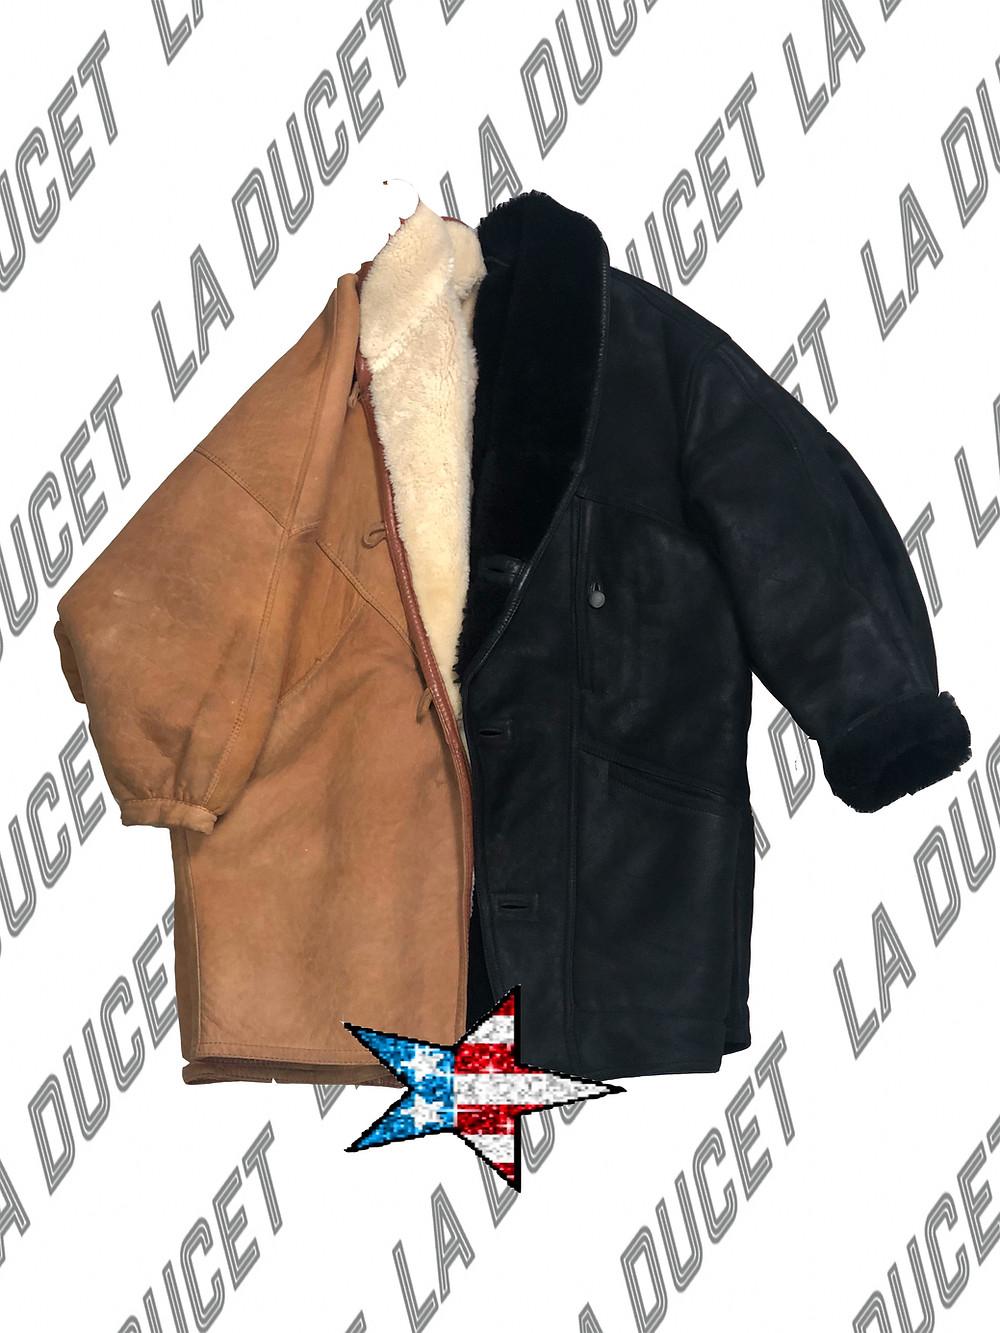 Nos gustaría proponerte looks tanto de día como Noche con este abrigo tan over size pero con mucho rollo.